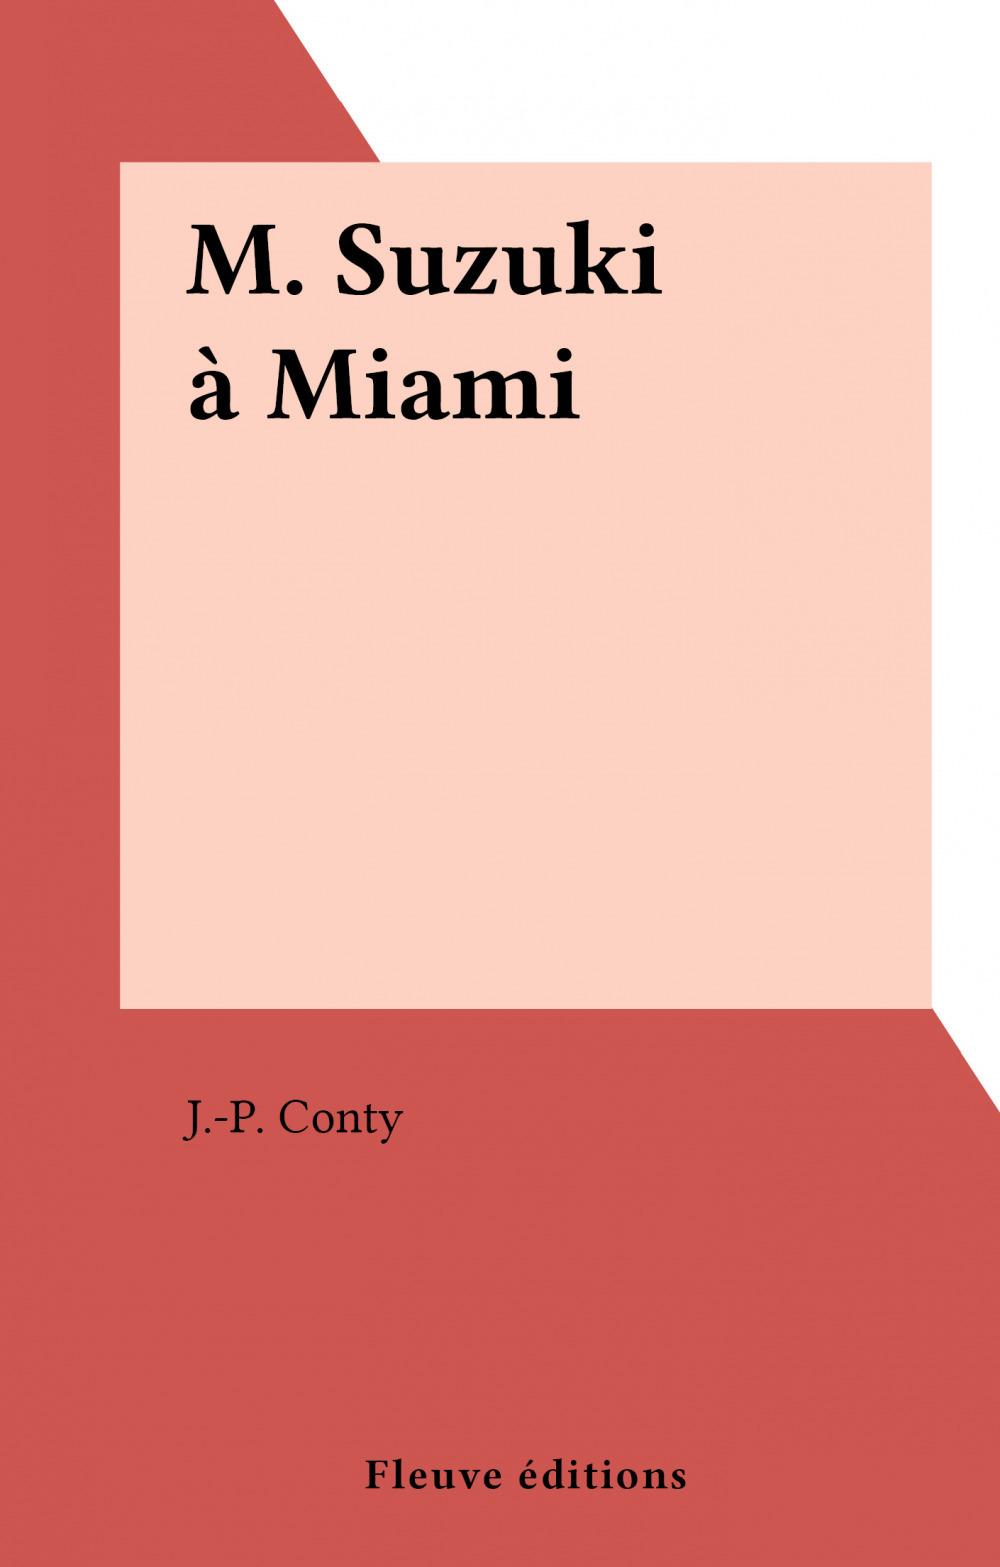 M. Suzuki à Miami